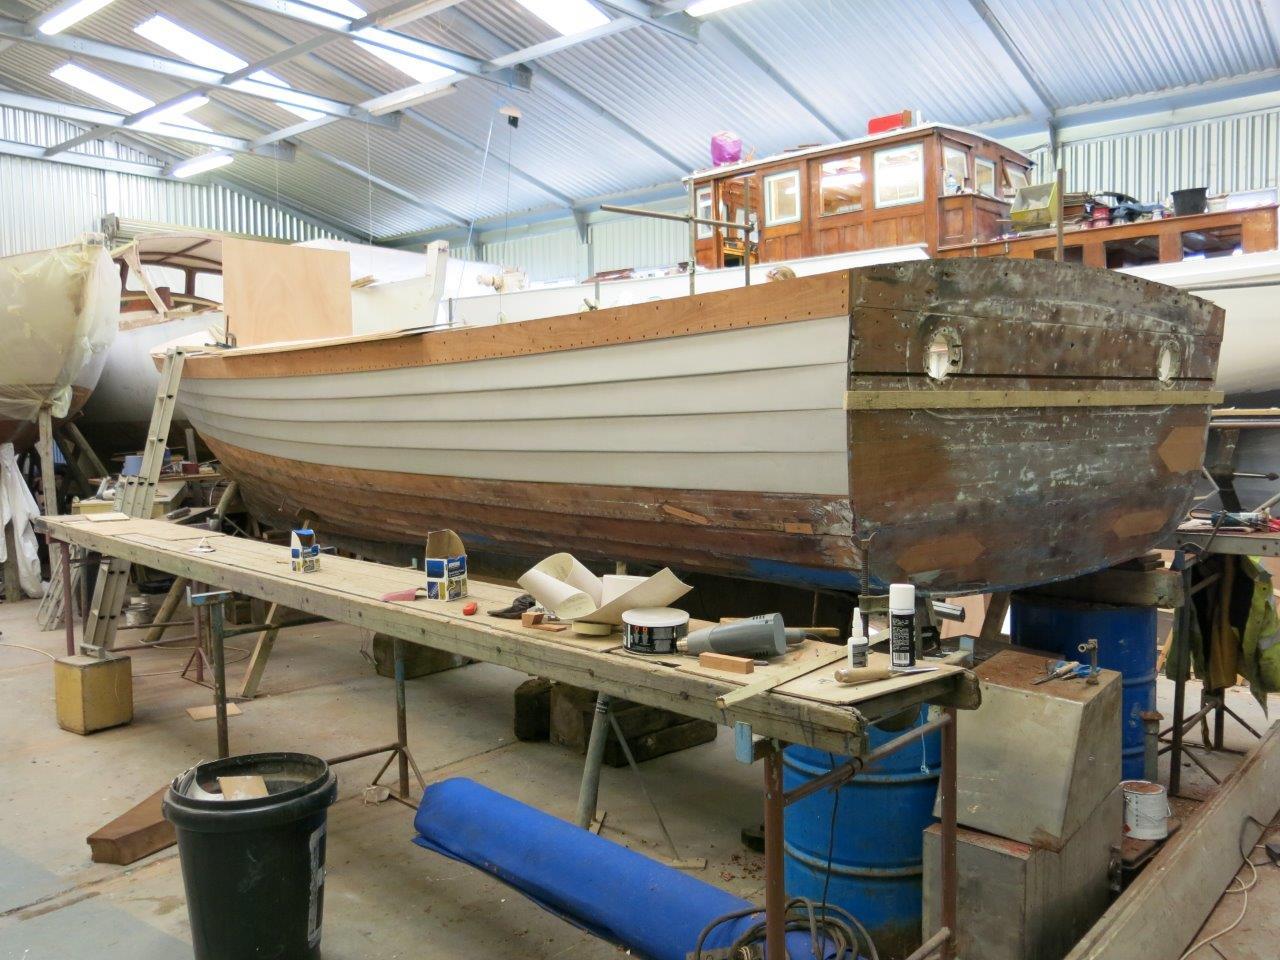 Nigella restoration project in progress in shed